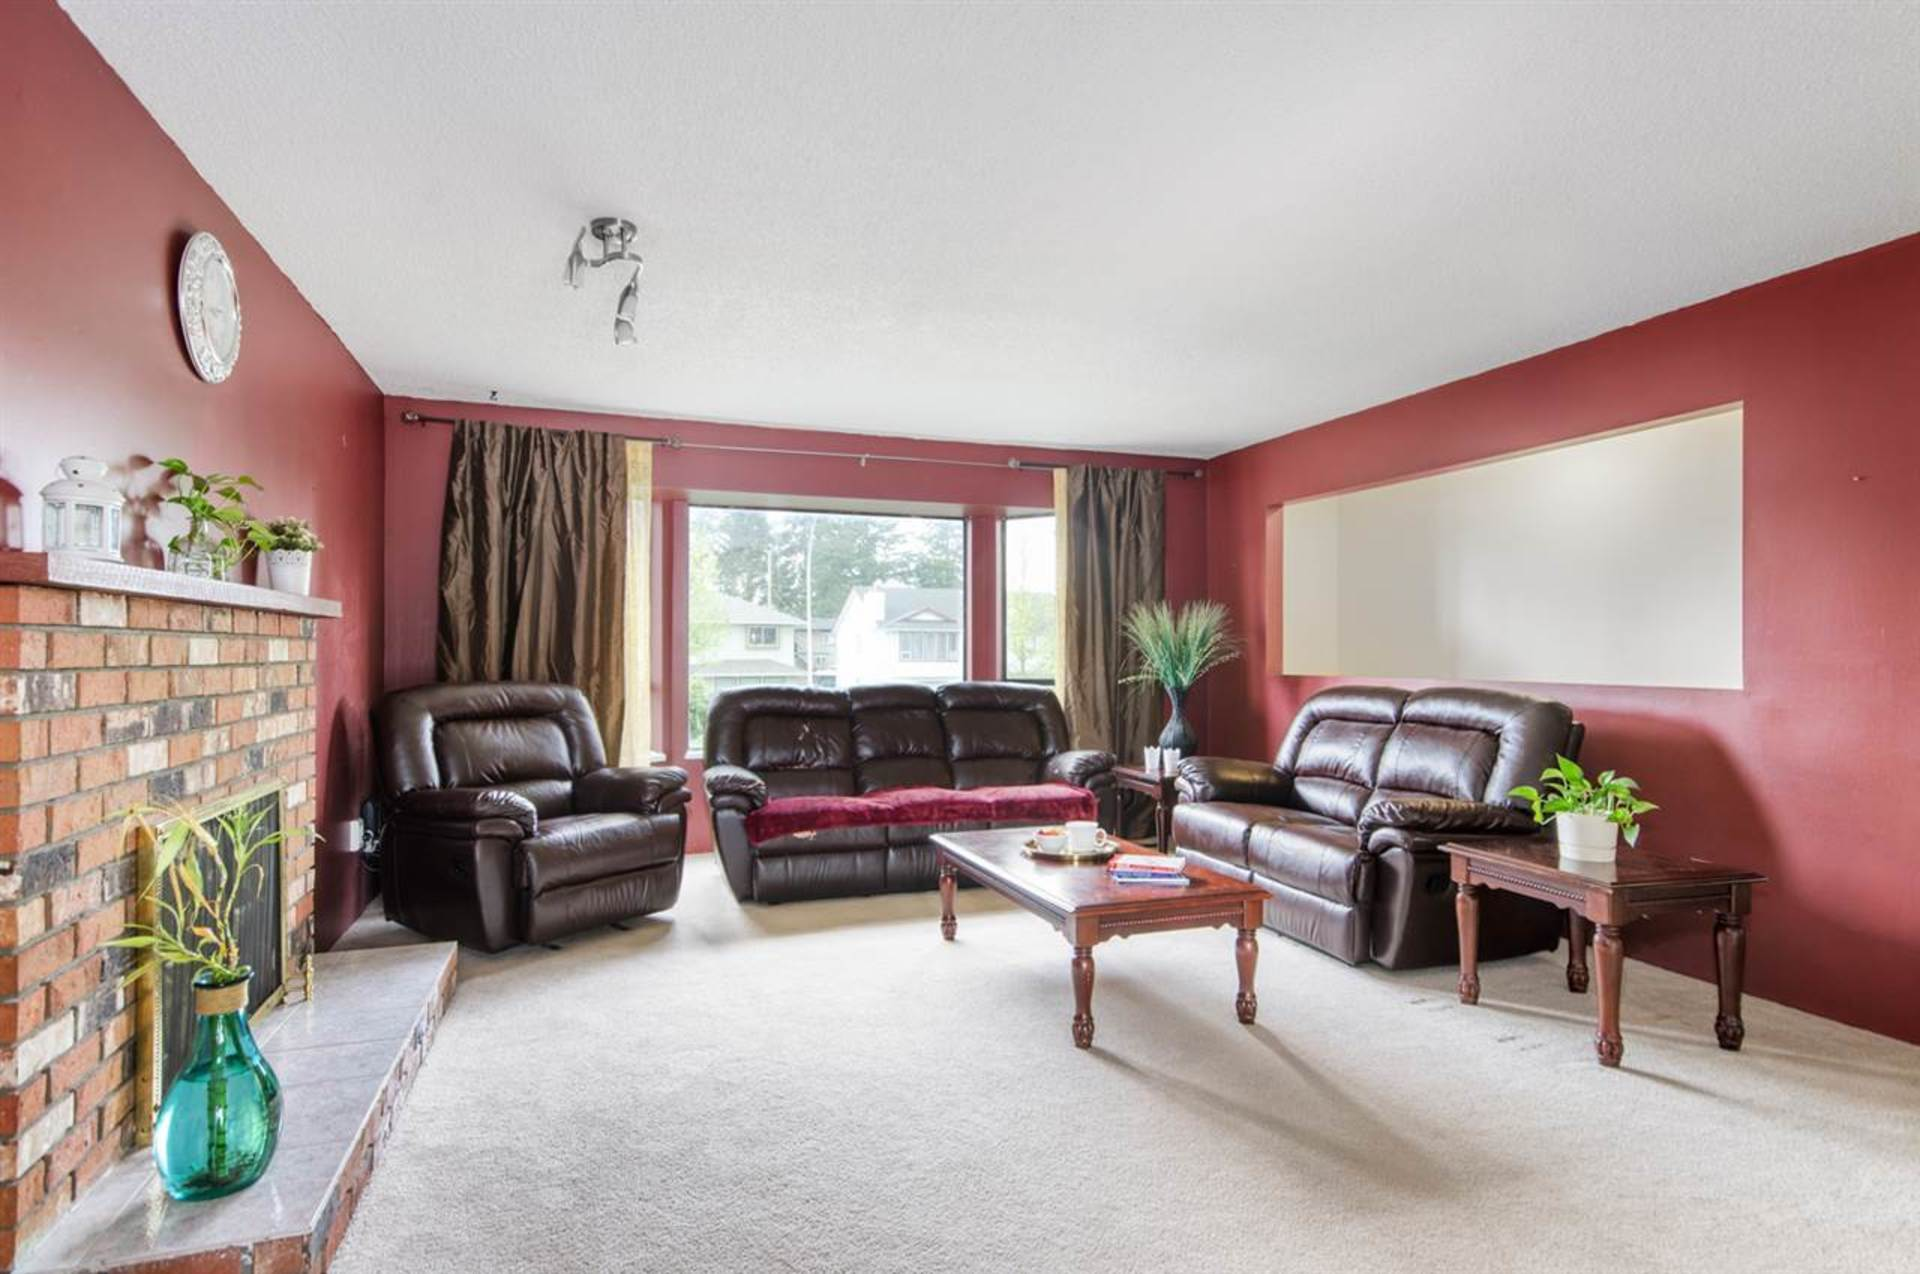 14235-72-avenue-east-newton-surrey-04 at 14235 72 Avenue, East Newton, Surrey